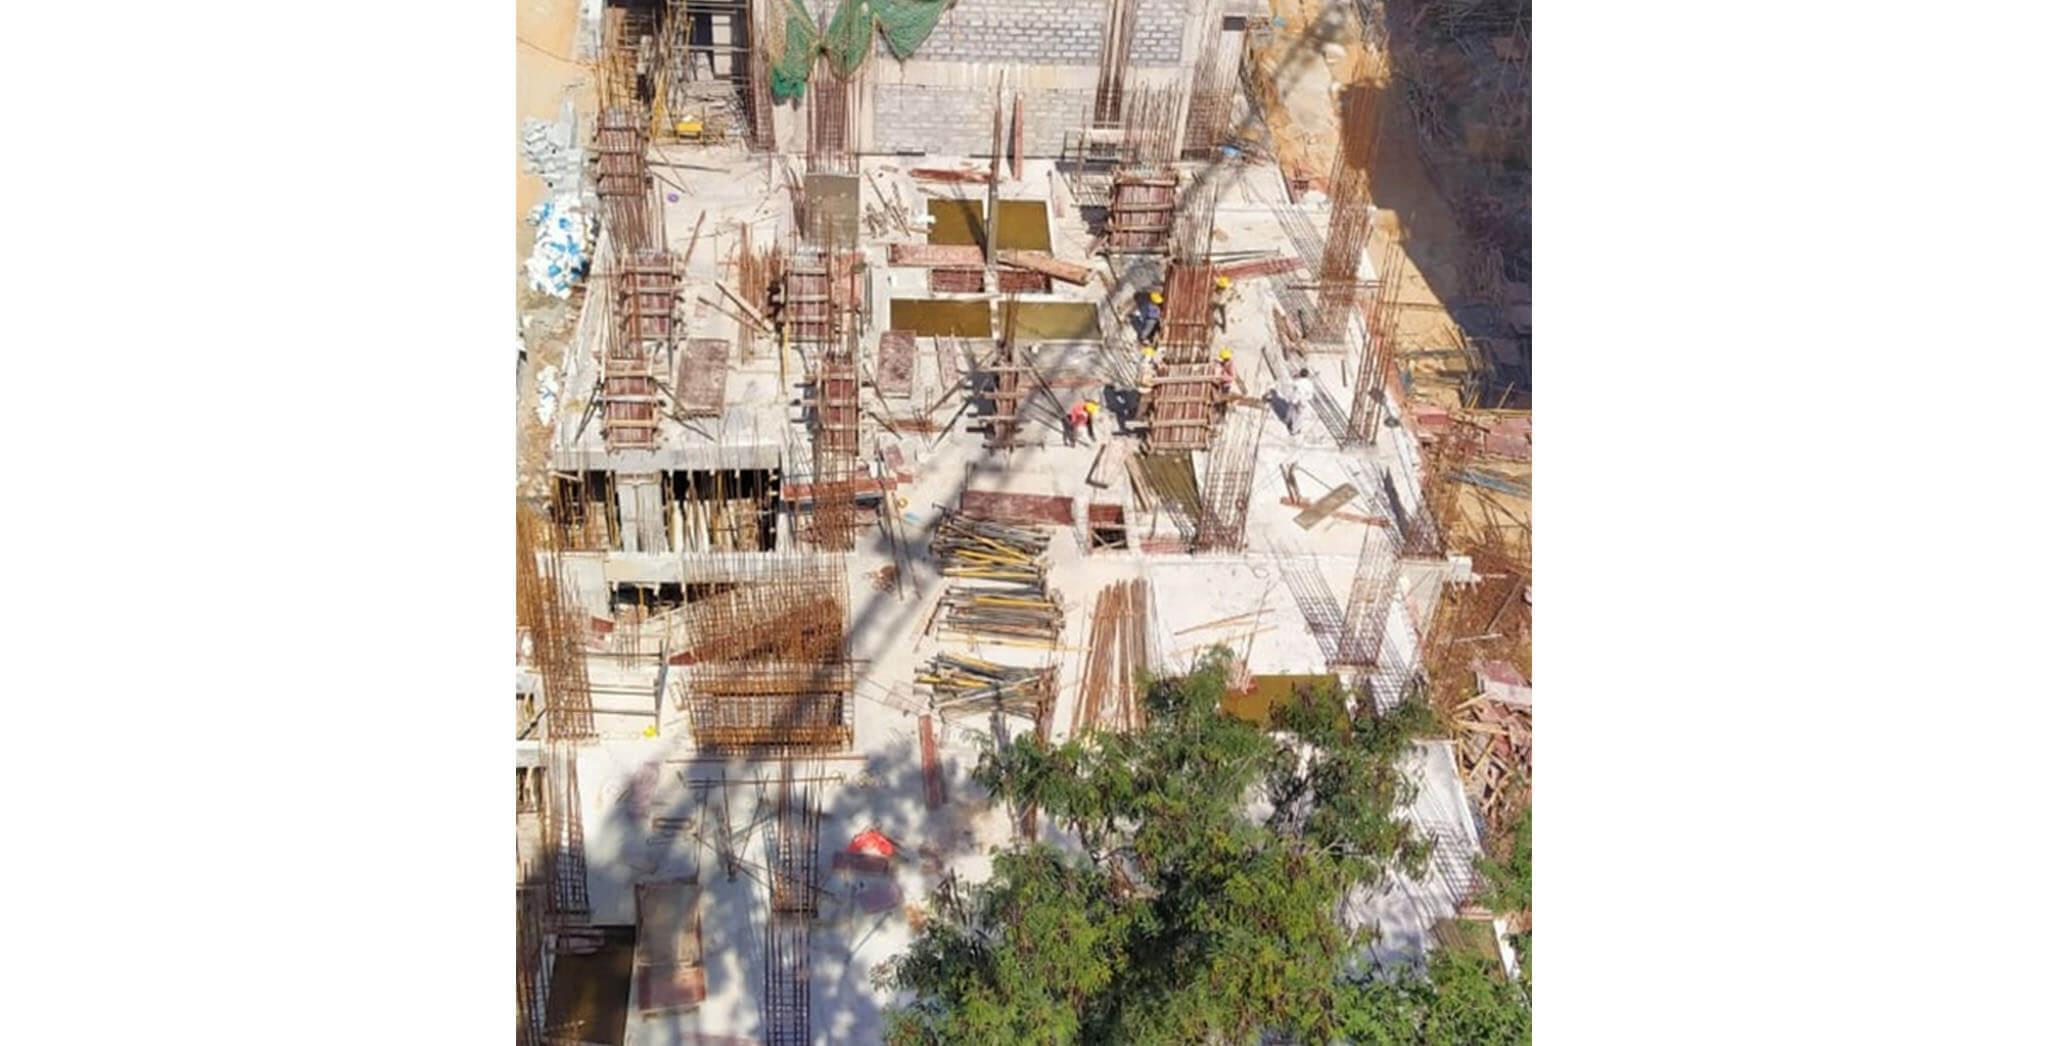 Aug 2020 - S Block: Ground floor slab reinforcement work-in-progress.